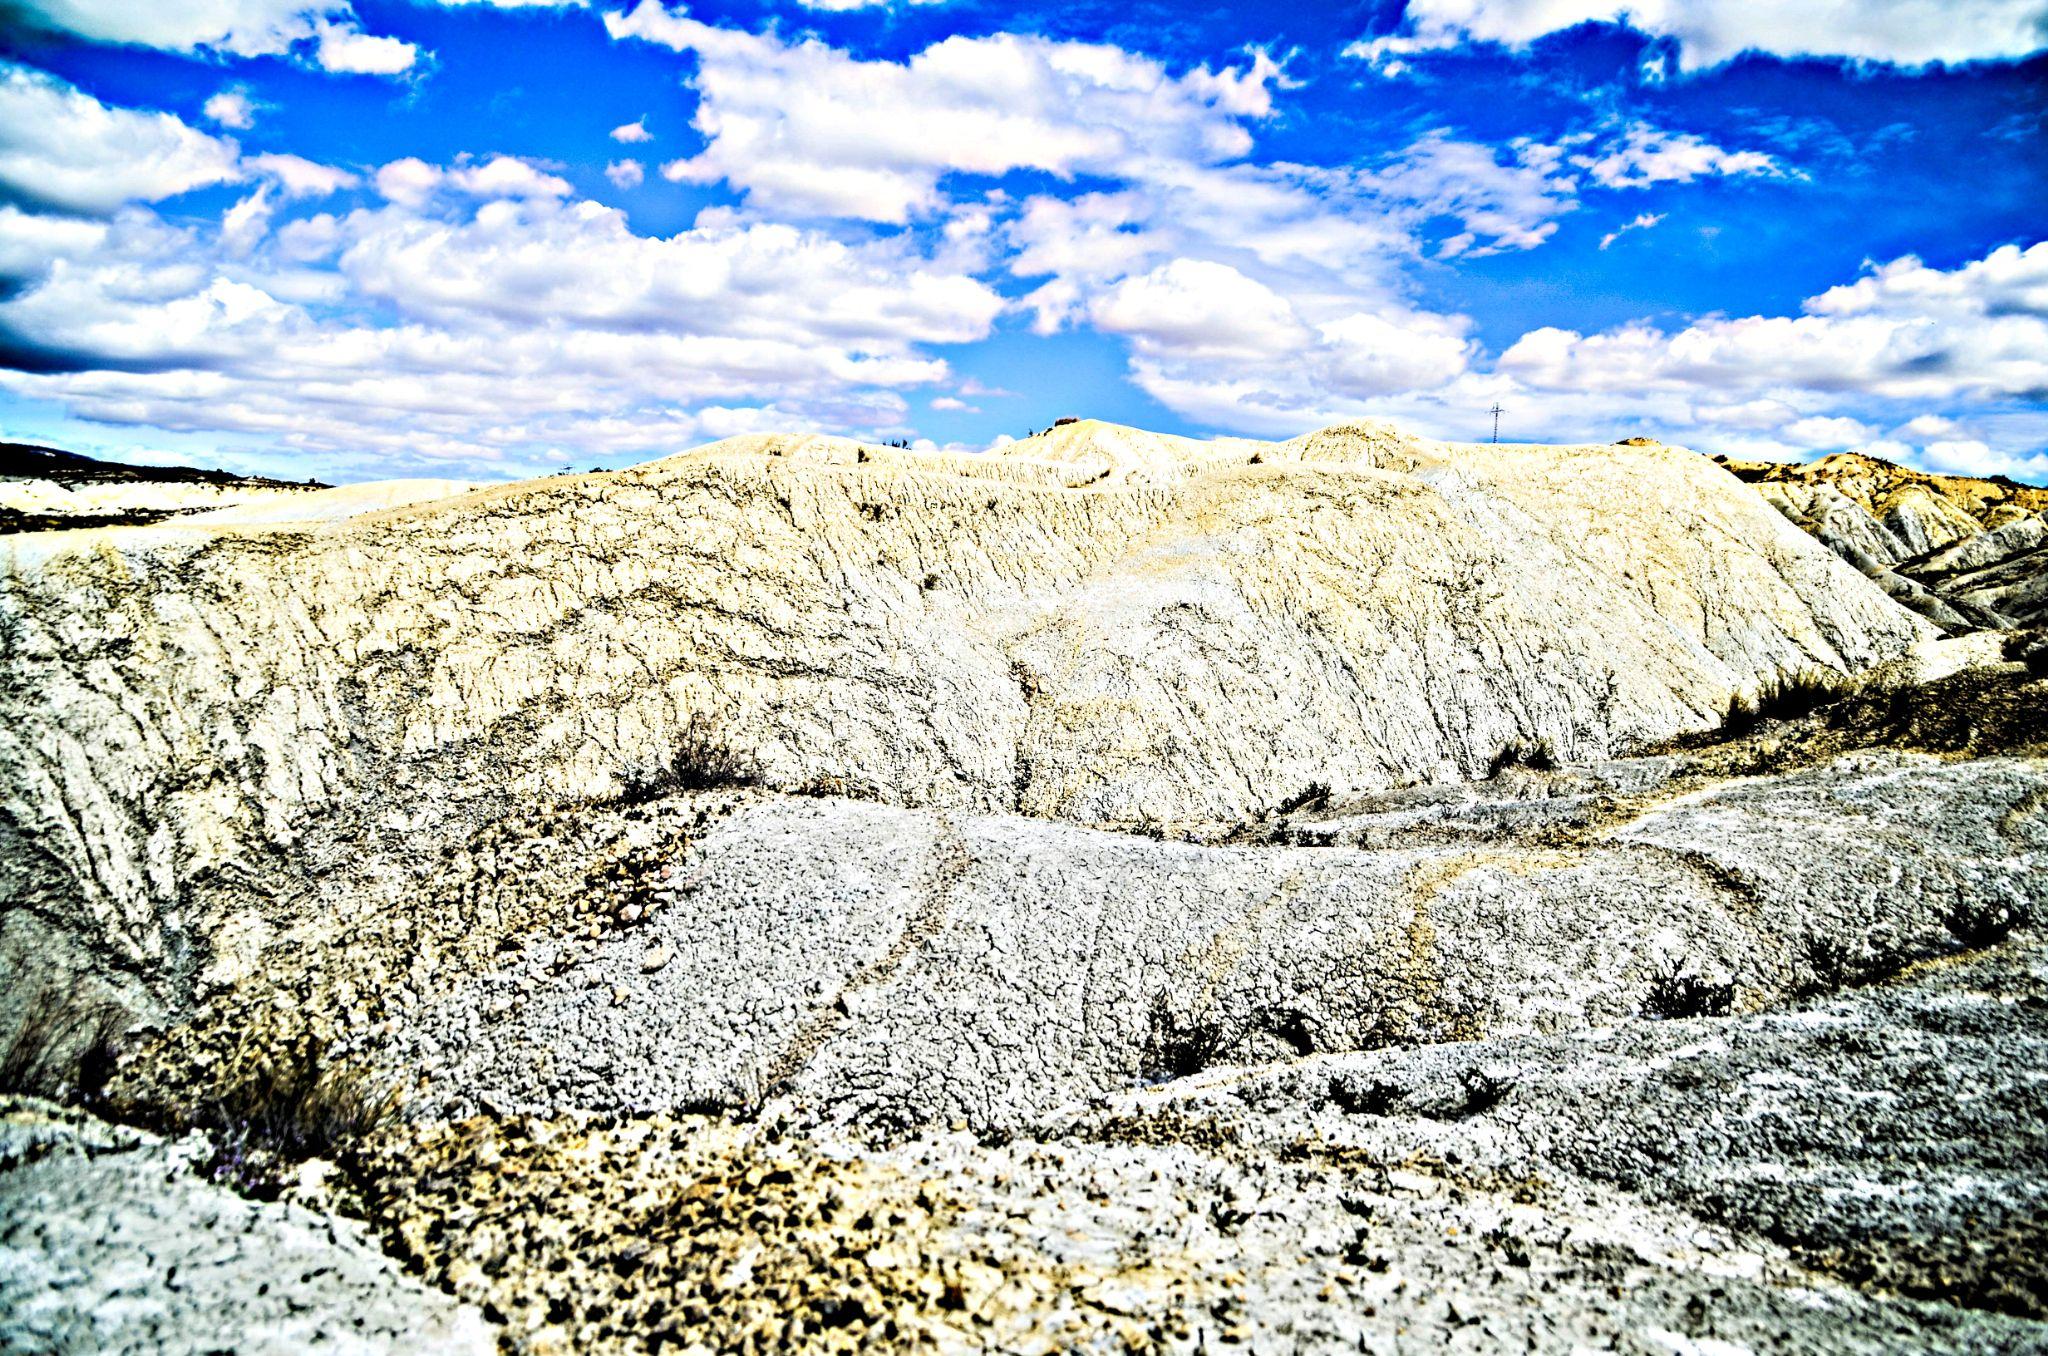 tierras blancas by juanalopez